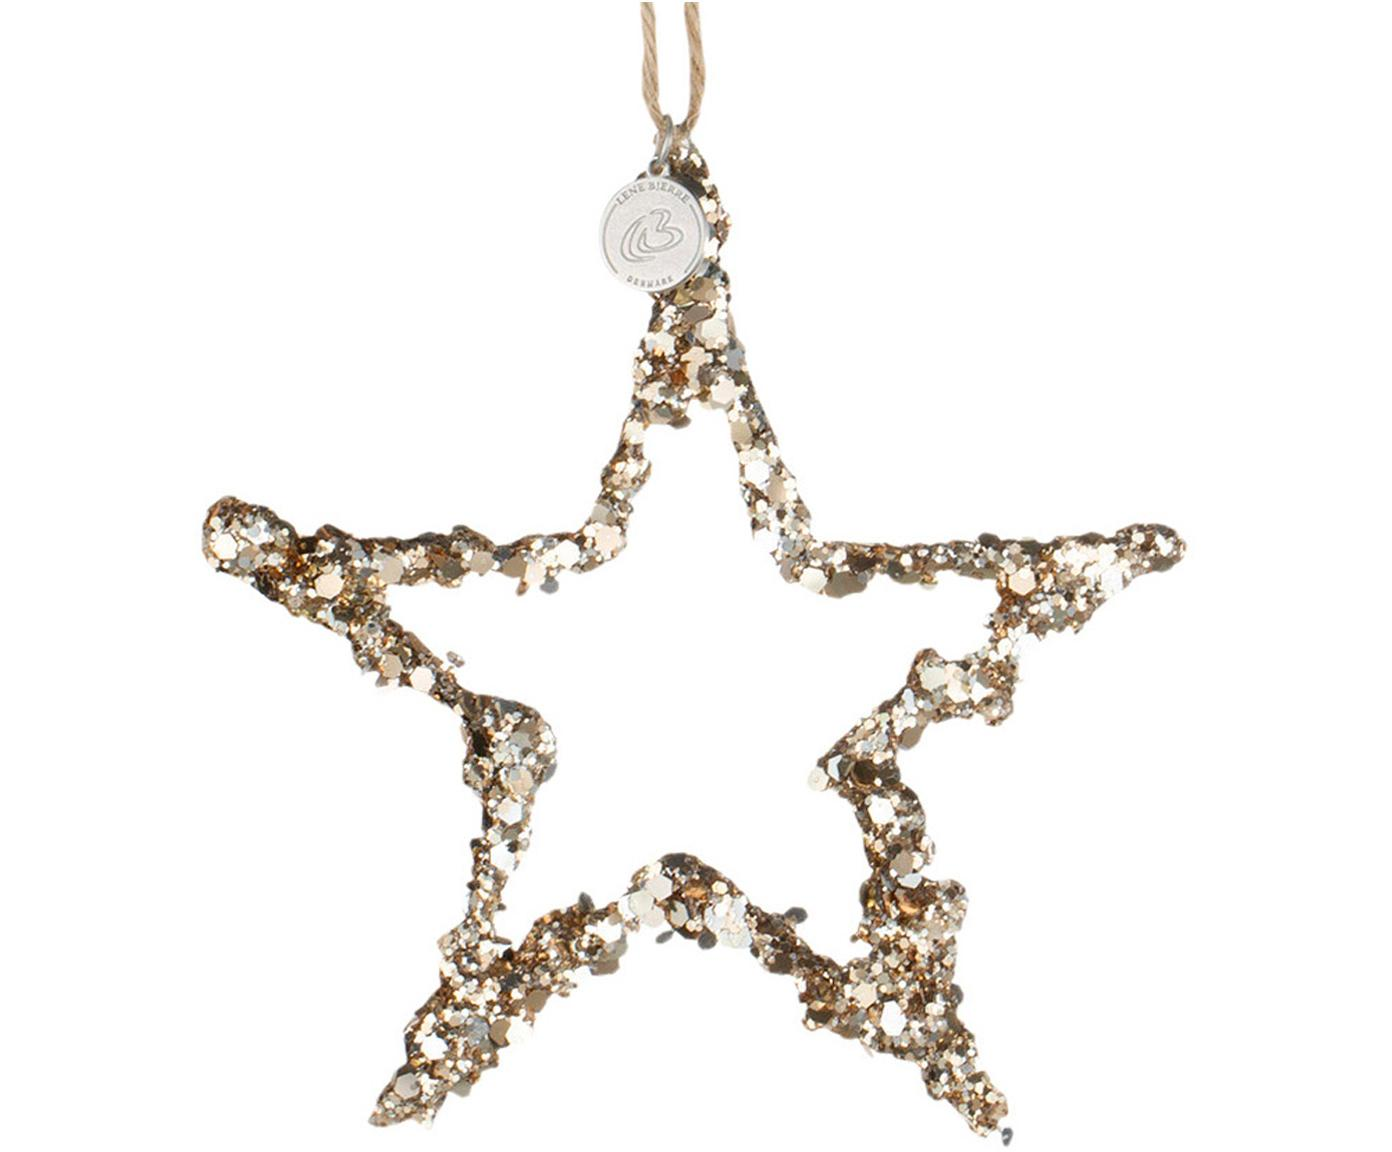 Kerstboomhanger Flora Star, Goudkleurig, 12 x 13 cm